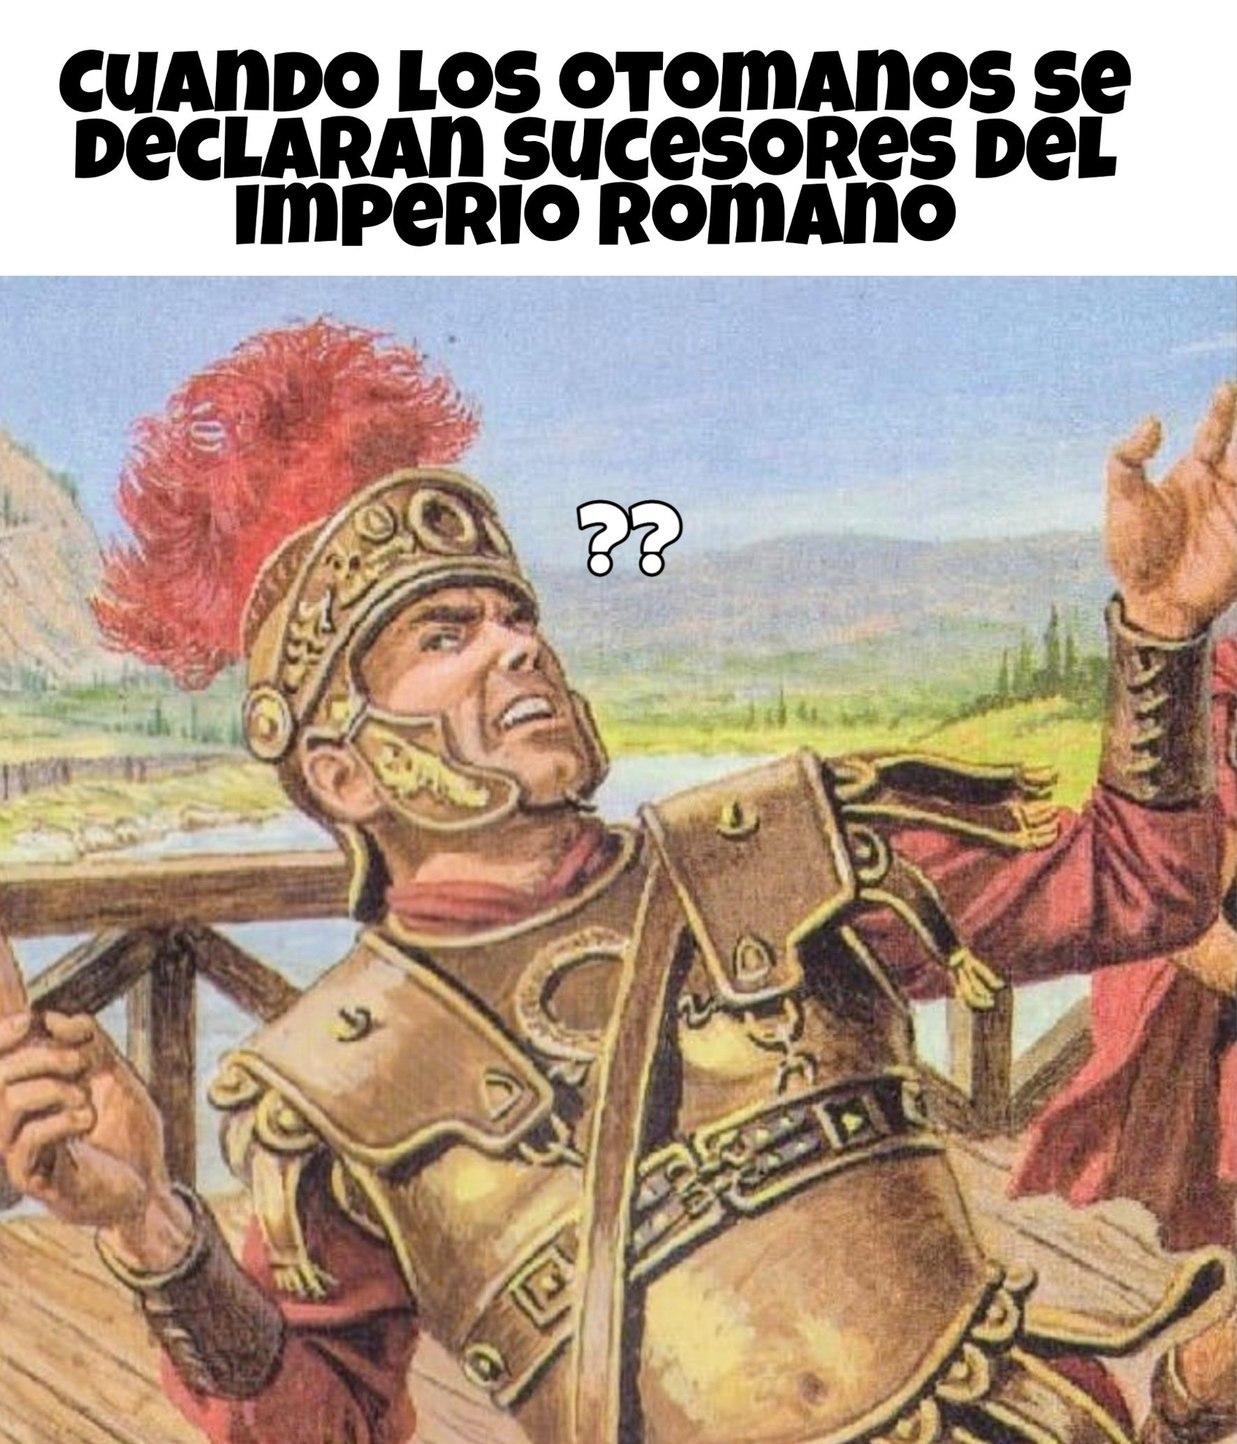 ¿Rusia es la tercera Roma? - meme